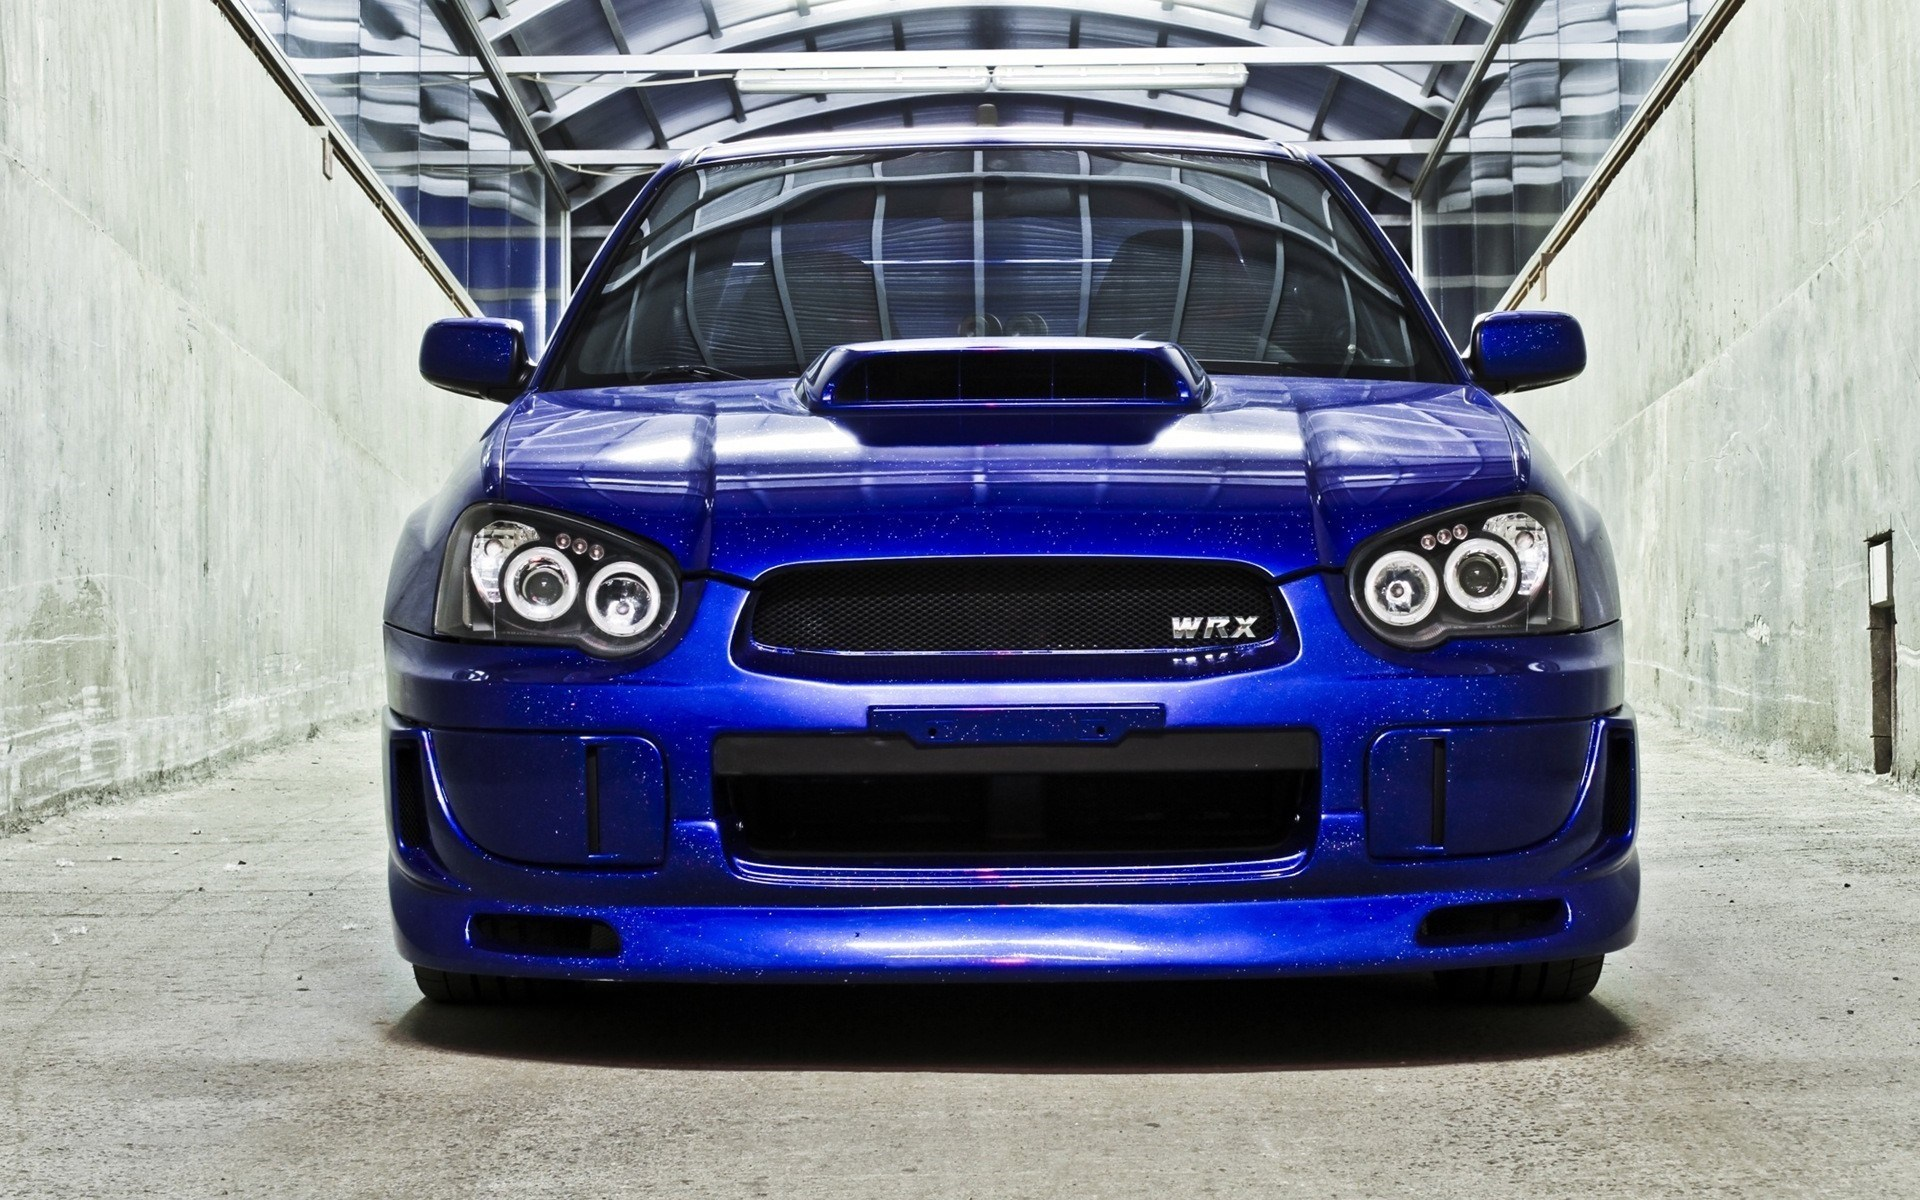 Subaru Impreza WRX STI Blue Front Car